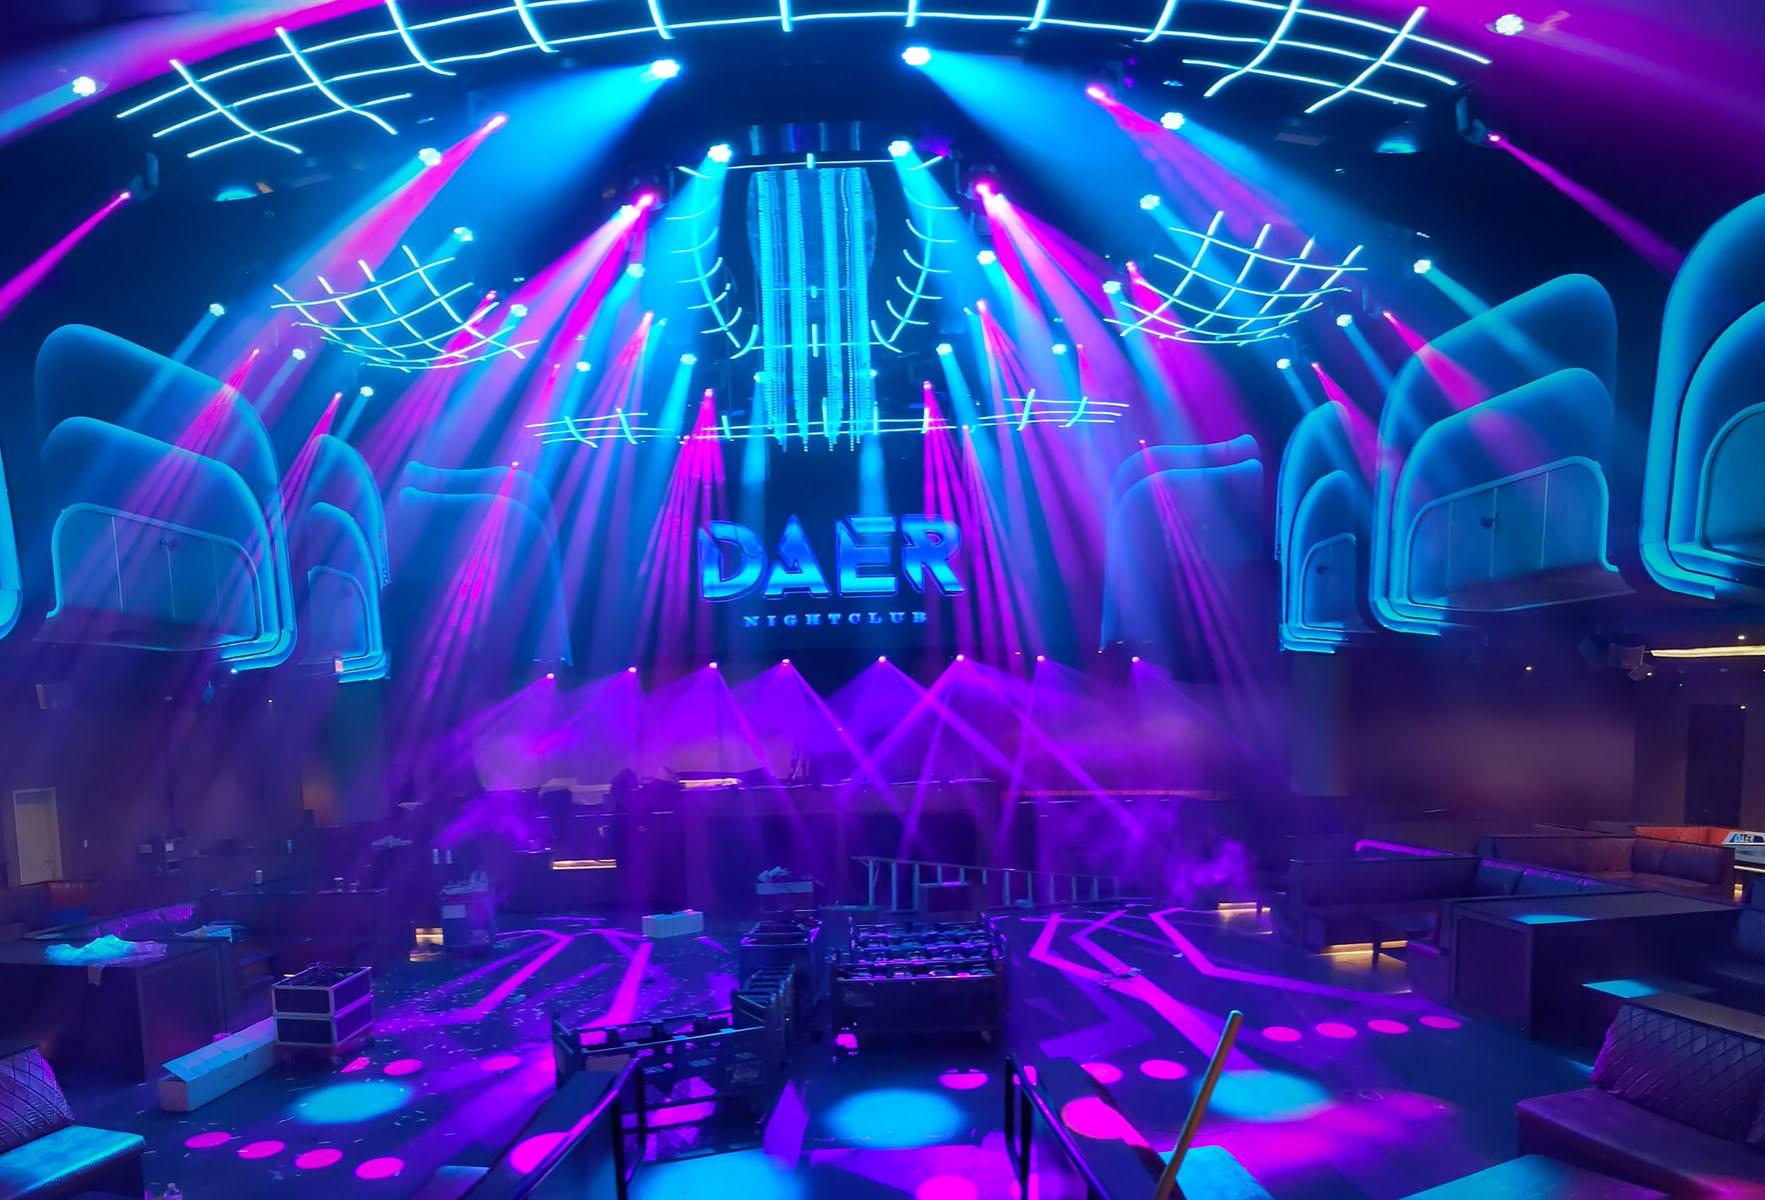 daer nightclub wins mondo lighting design award daer nightclub wins mondo lighting